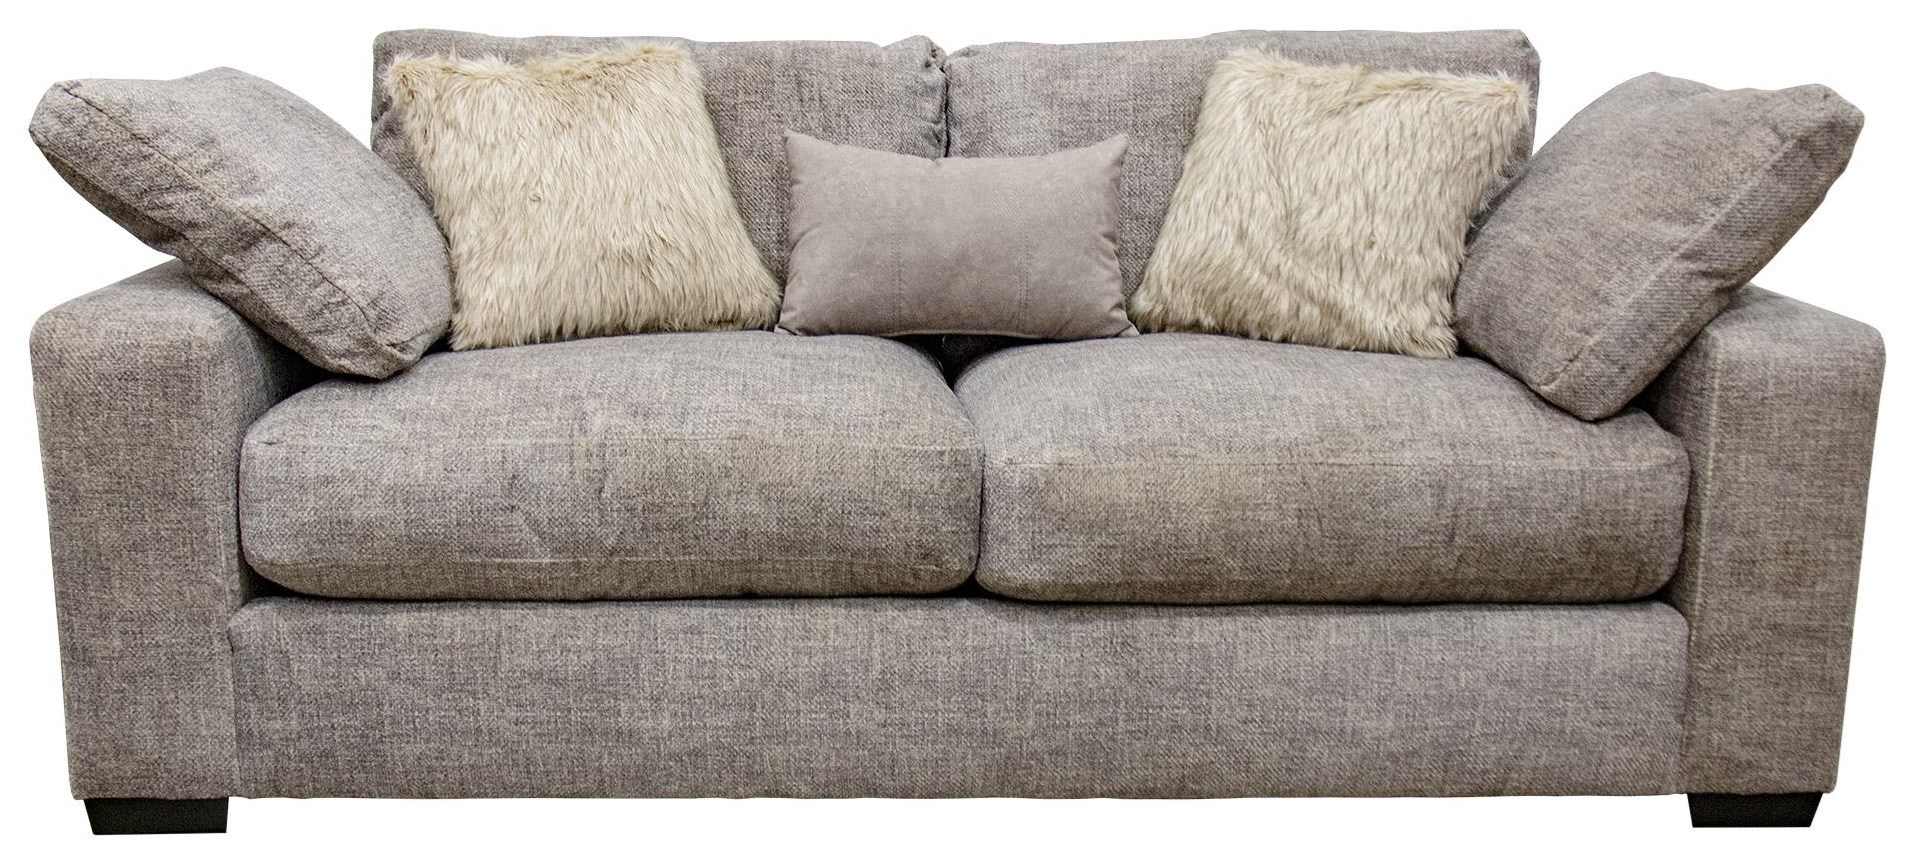 Albany 8668 2-Seat Sofa - Item Number: 8668-00-GENS-26292